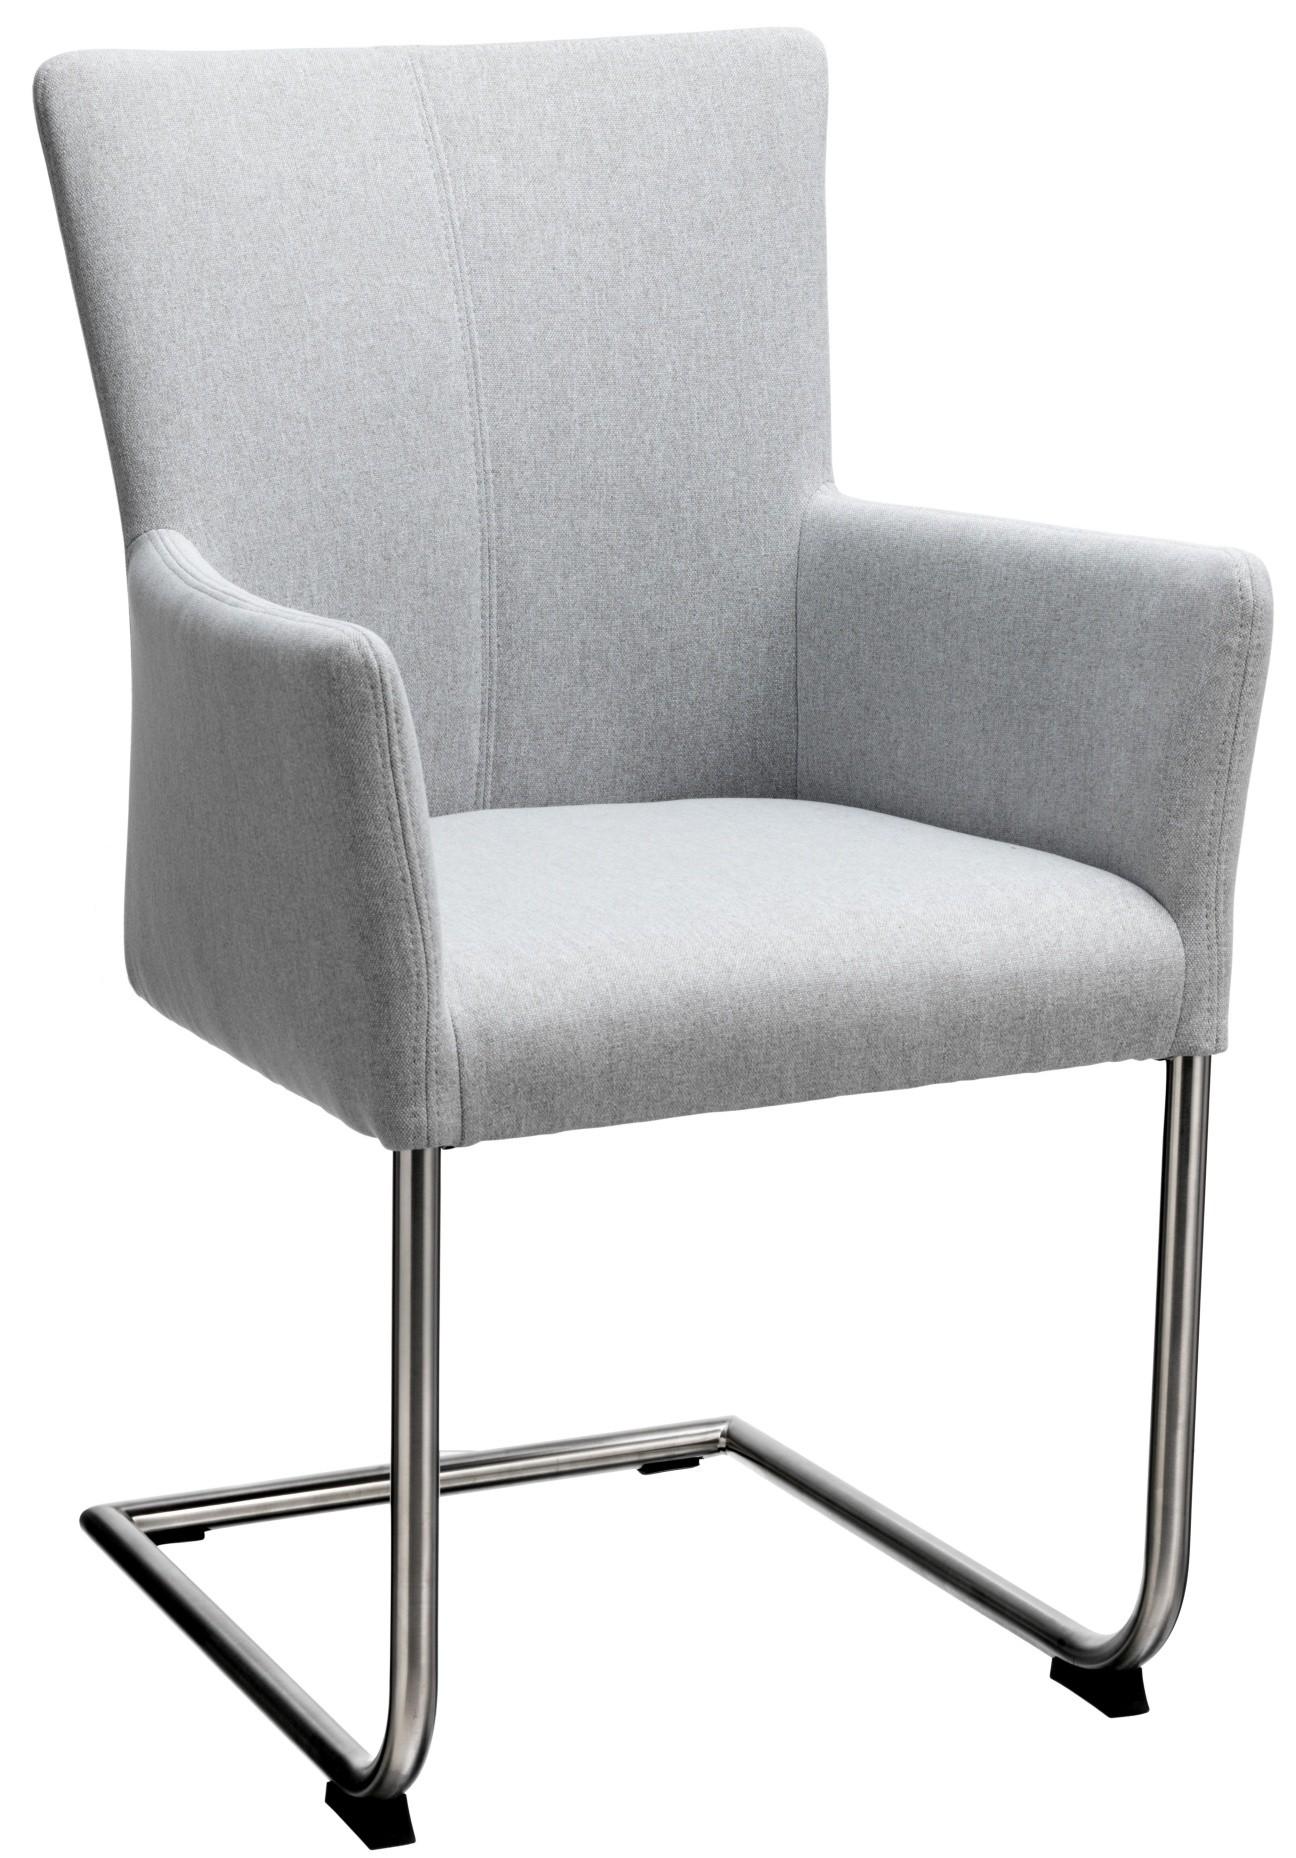 24designs stoel tulipa armleuningen zitting stof for Design stoel 24